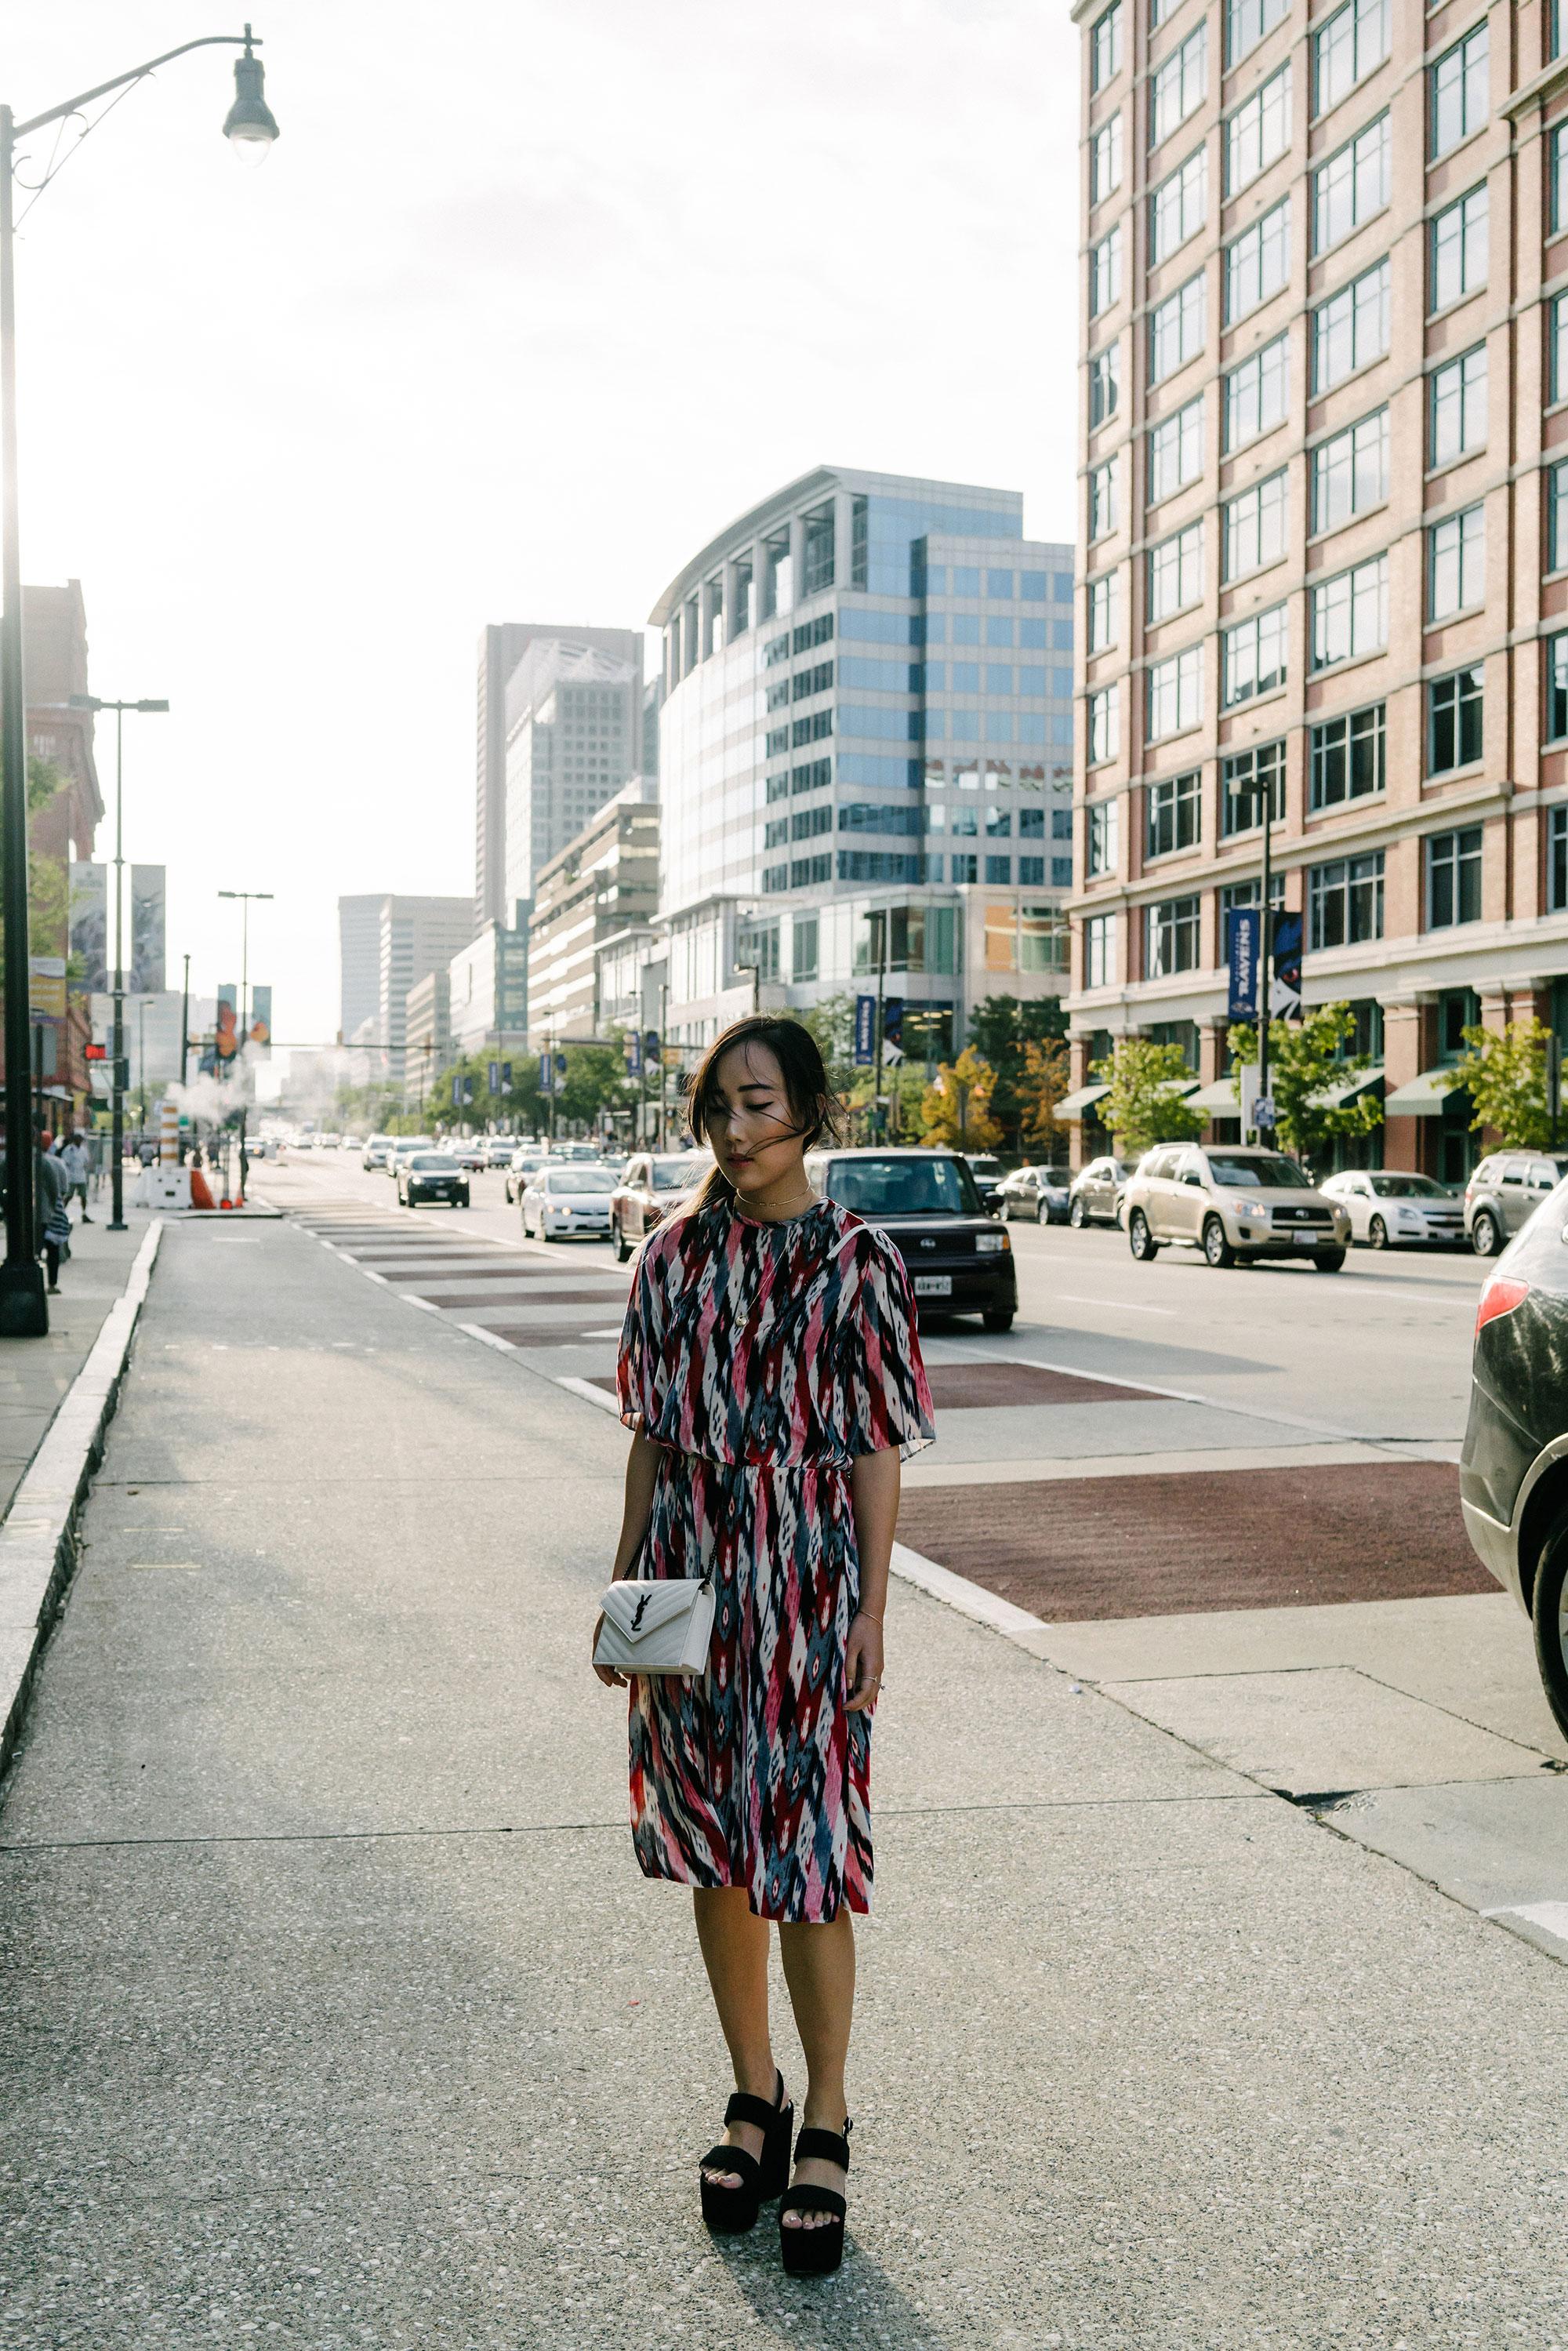 Isabel Marant Dress, Saint Laurent Shoes and Bag